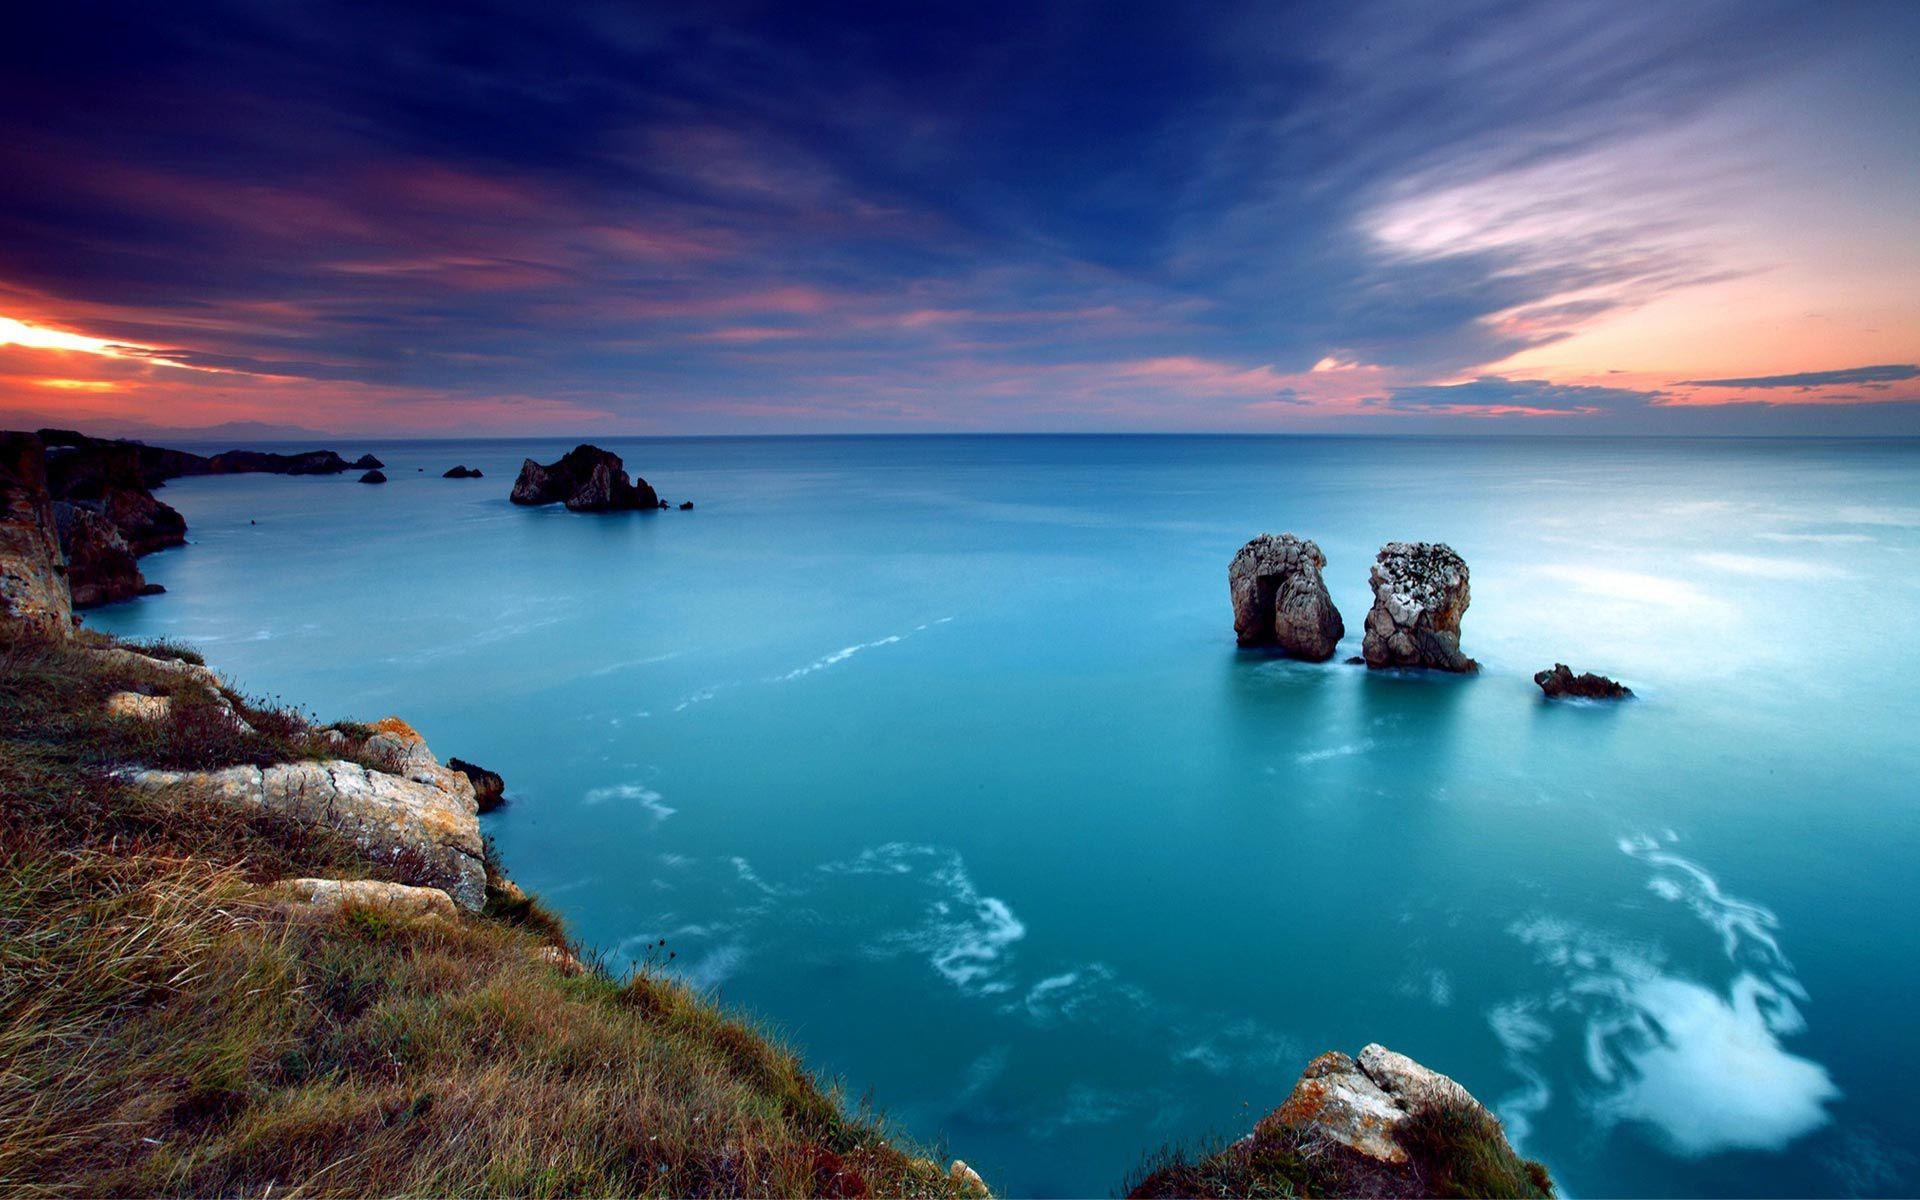 new beach photos view #745697 wallpapers | risewlp | feelgrafix